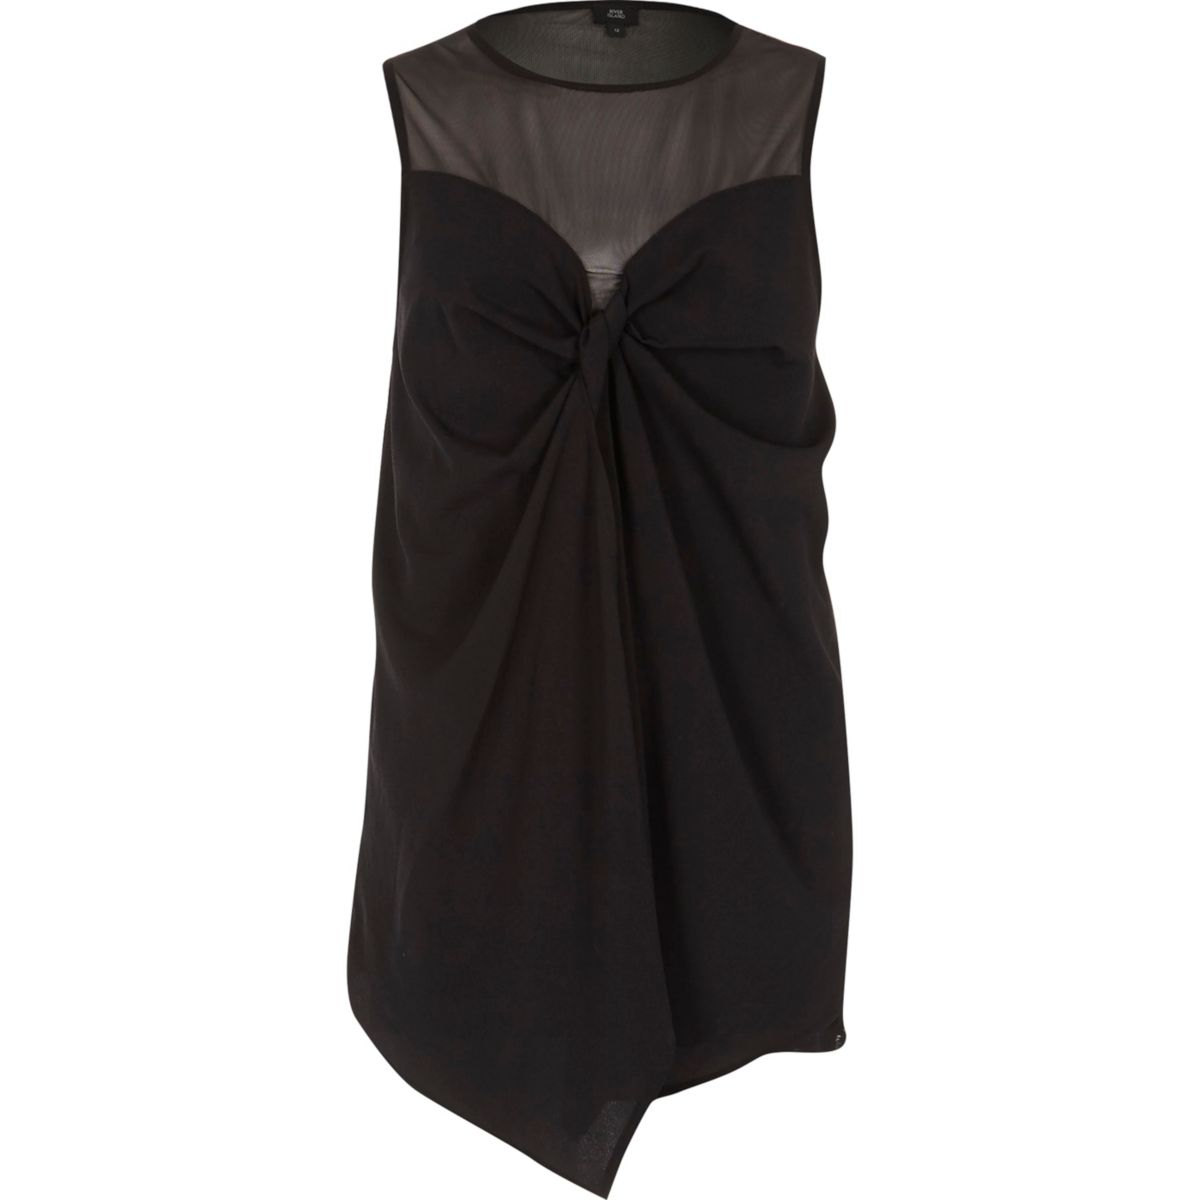 Black mesh bow front sleeveless top